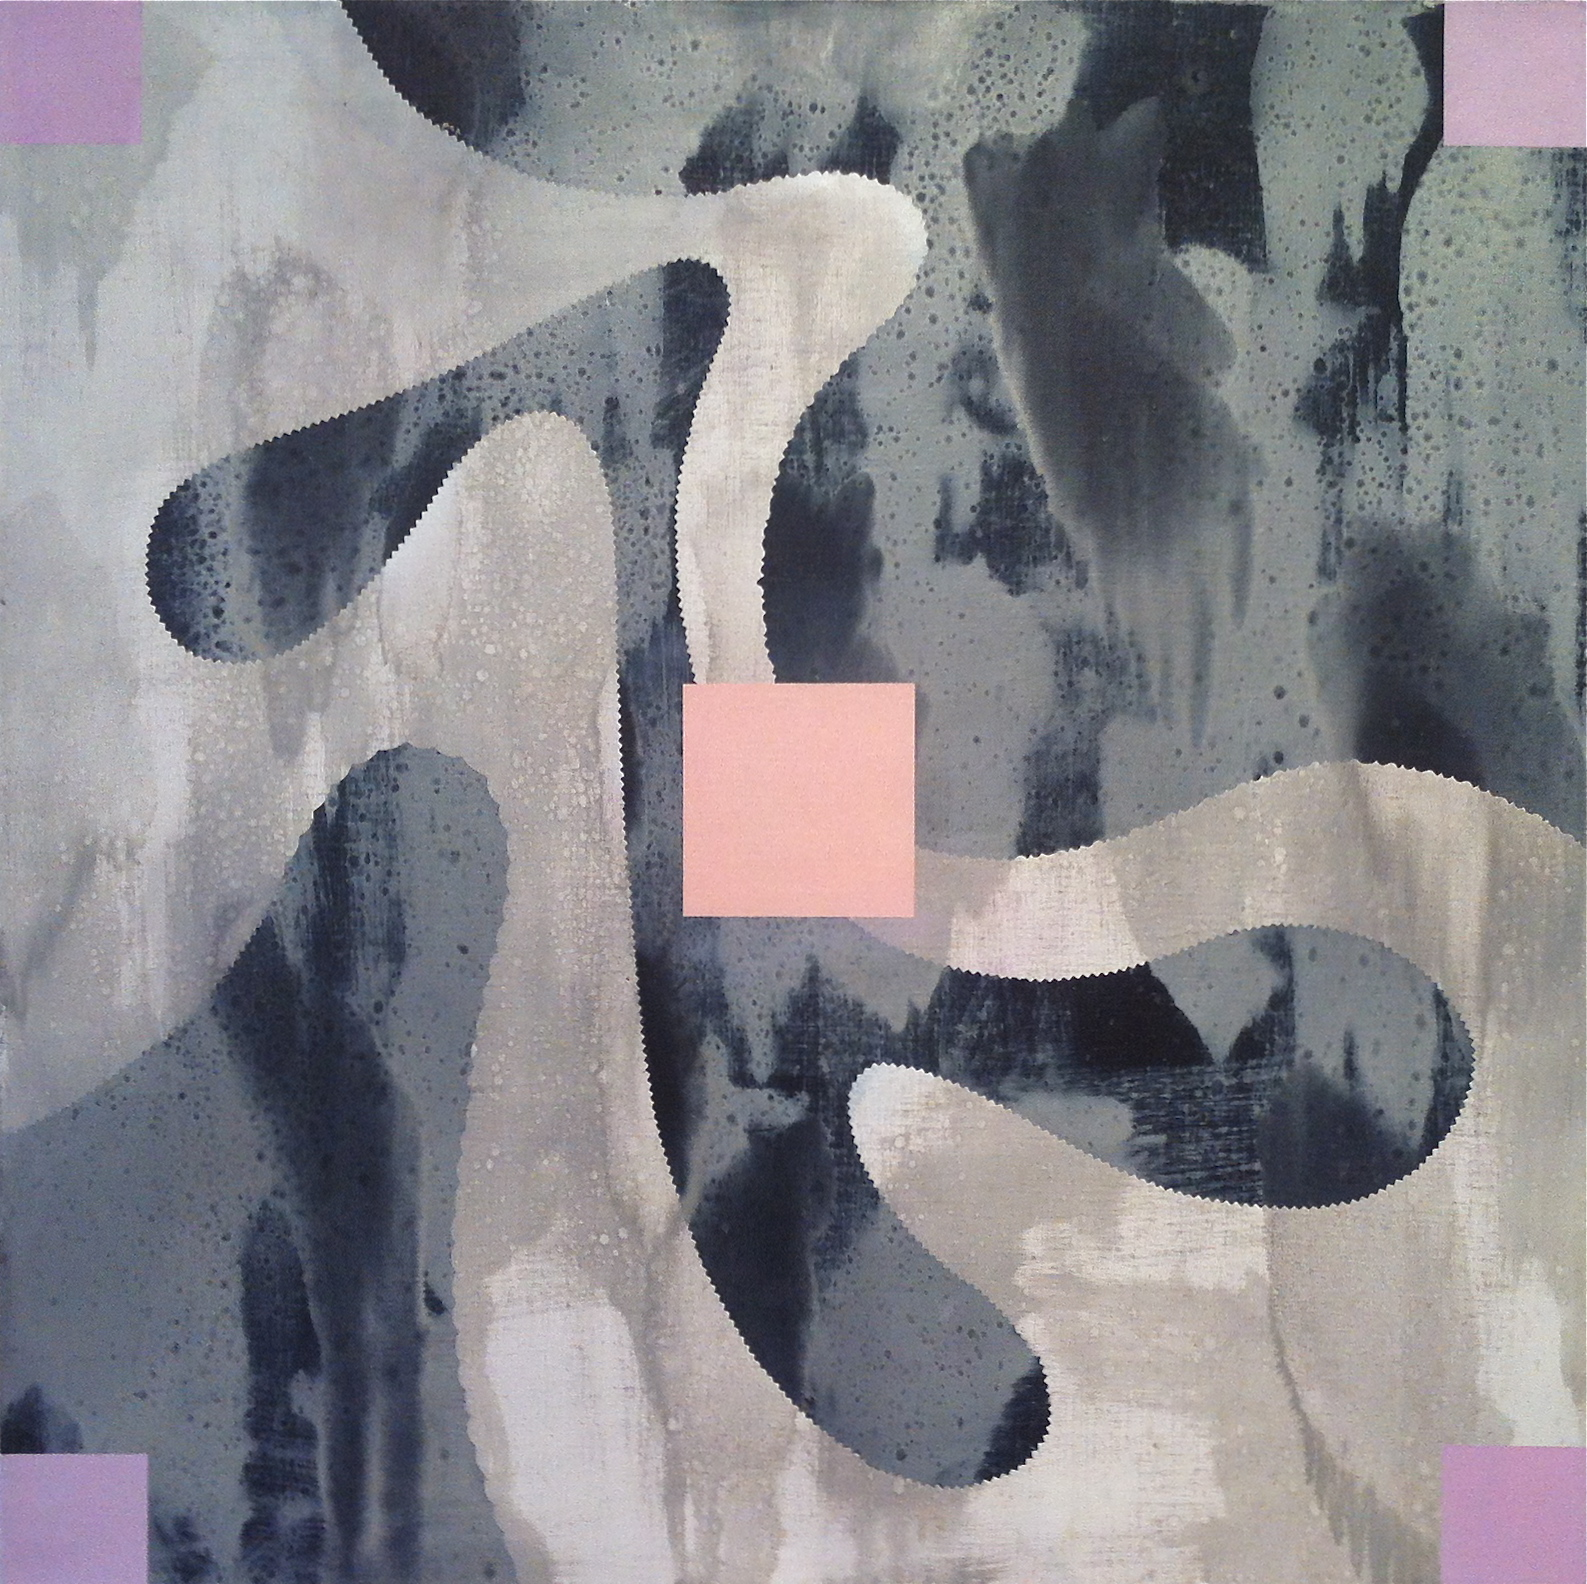 Ryderesque, 35 x 35, oil on linen, 2014